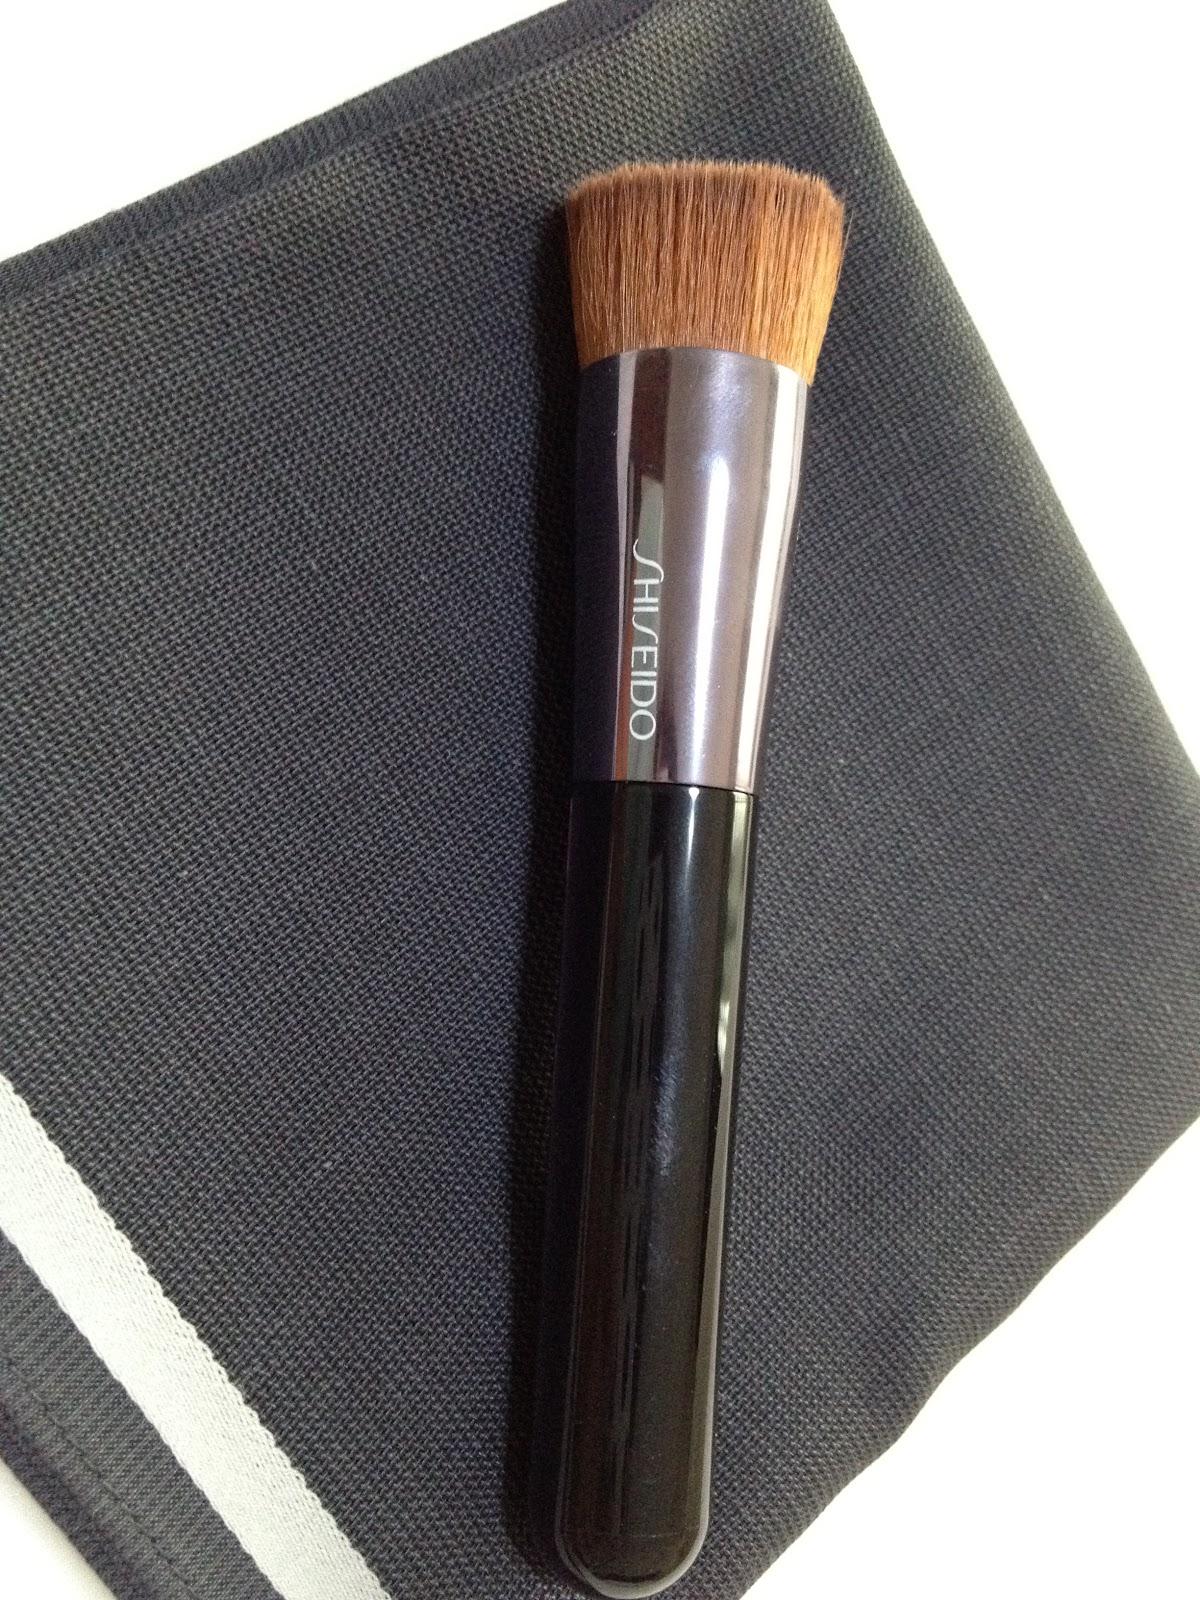 Foundation Brush: Miaka's Life And Loves: Review: Shiseido Perfect